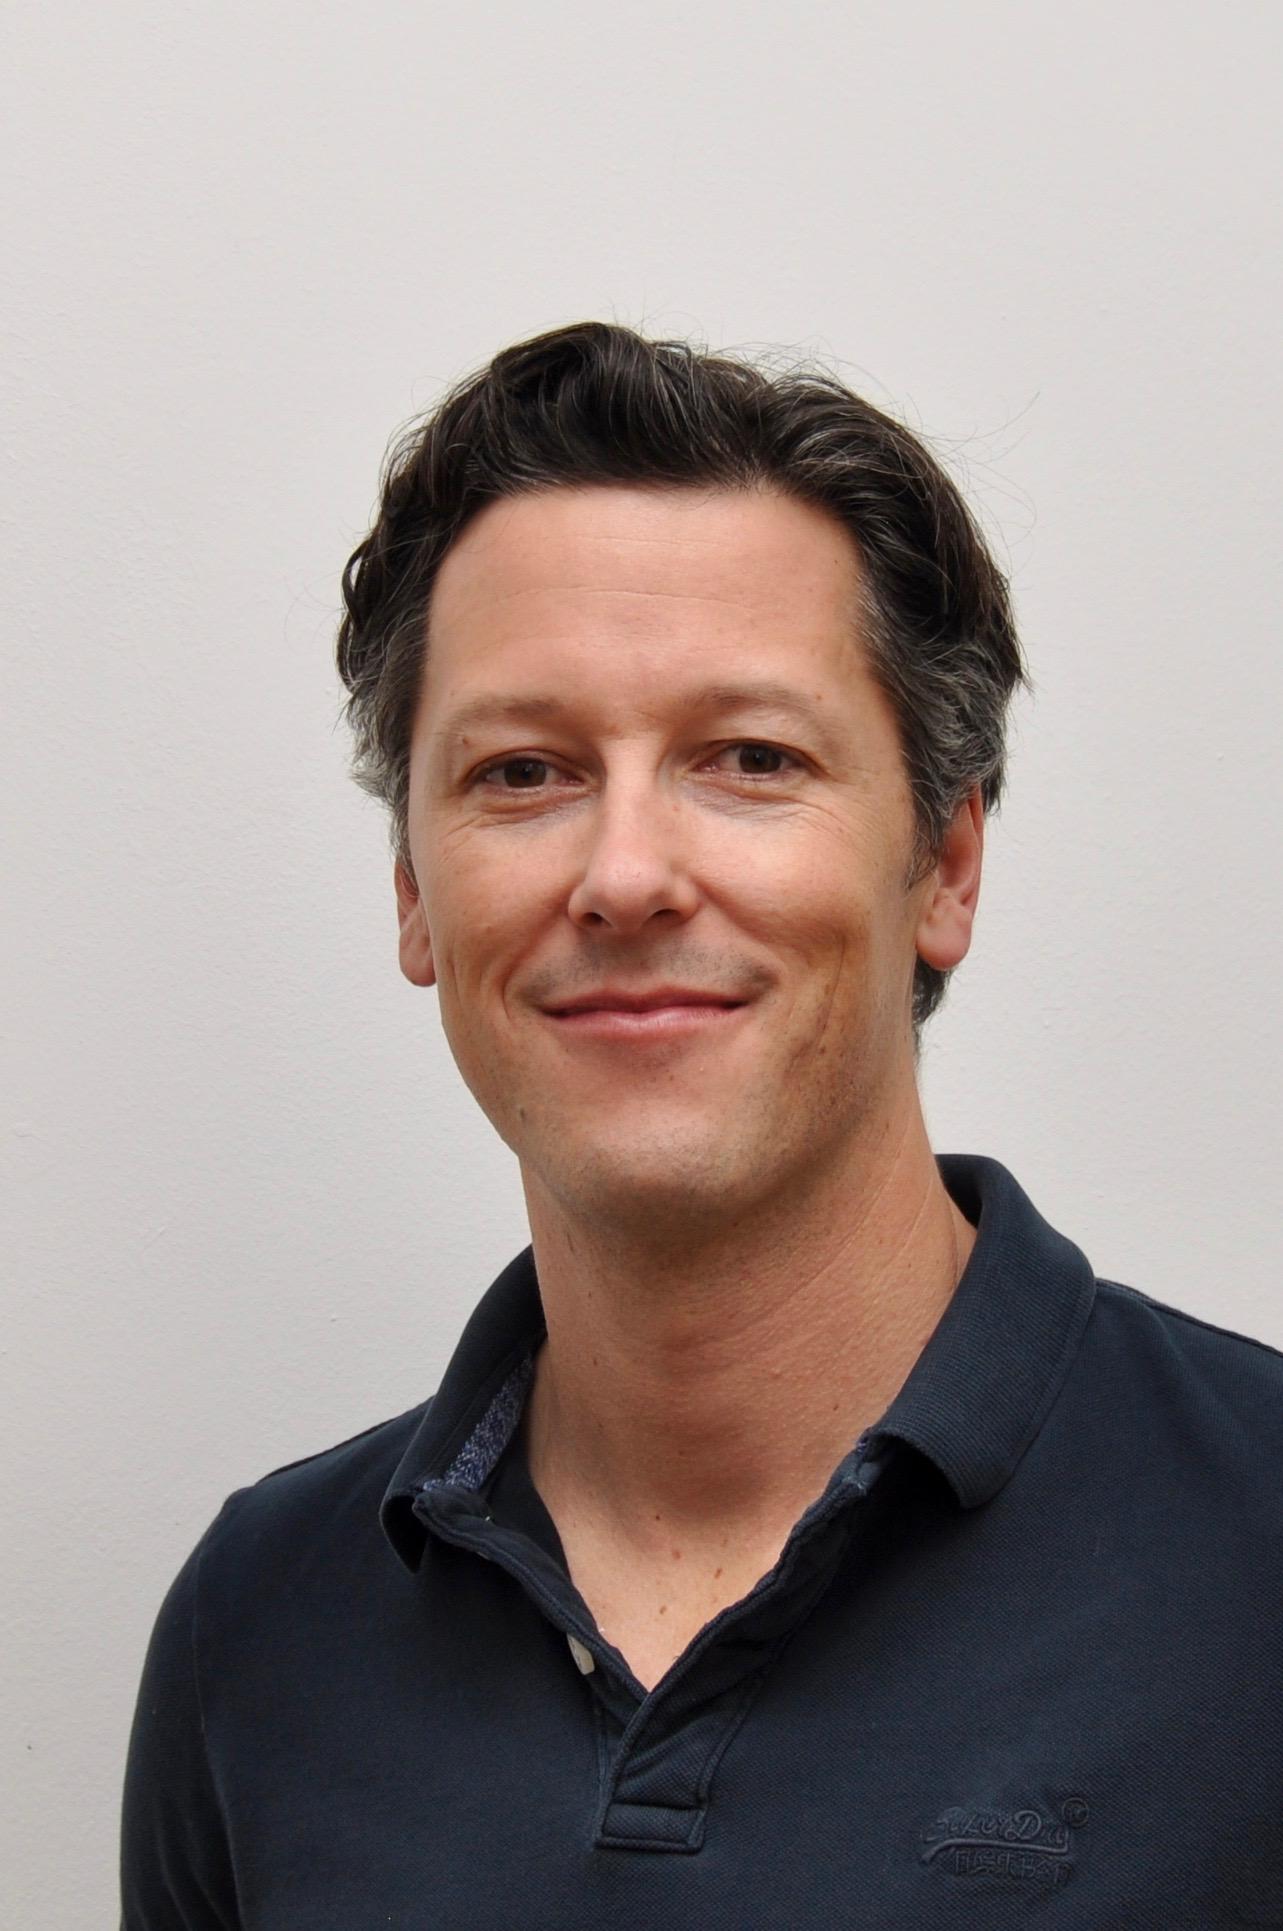 Dr. Georg Culen